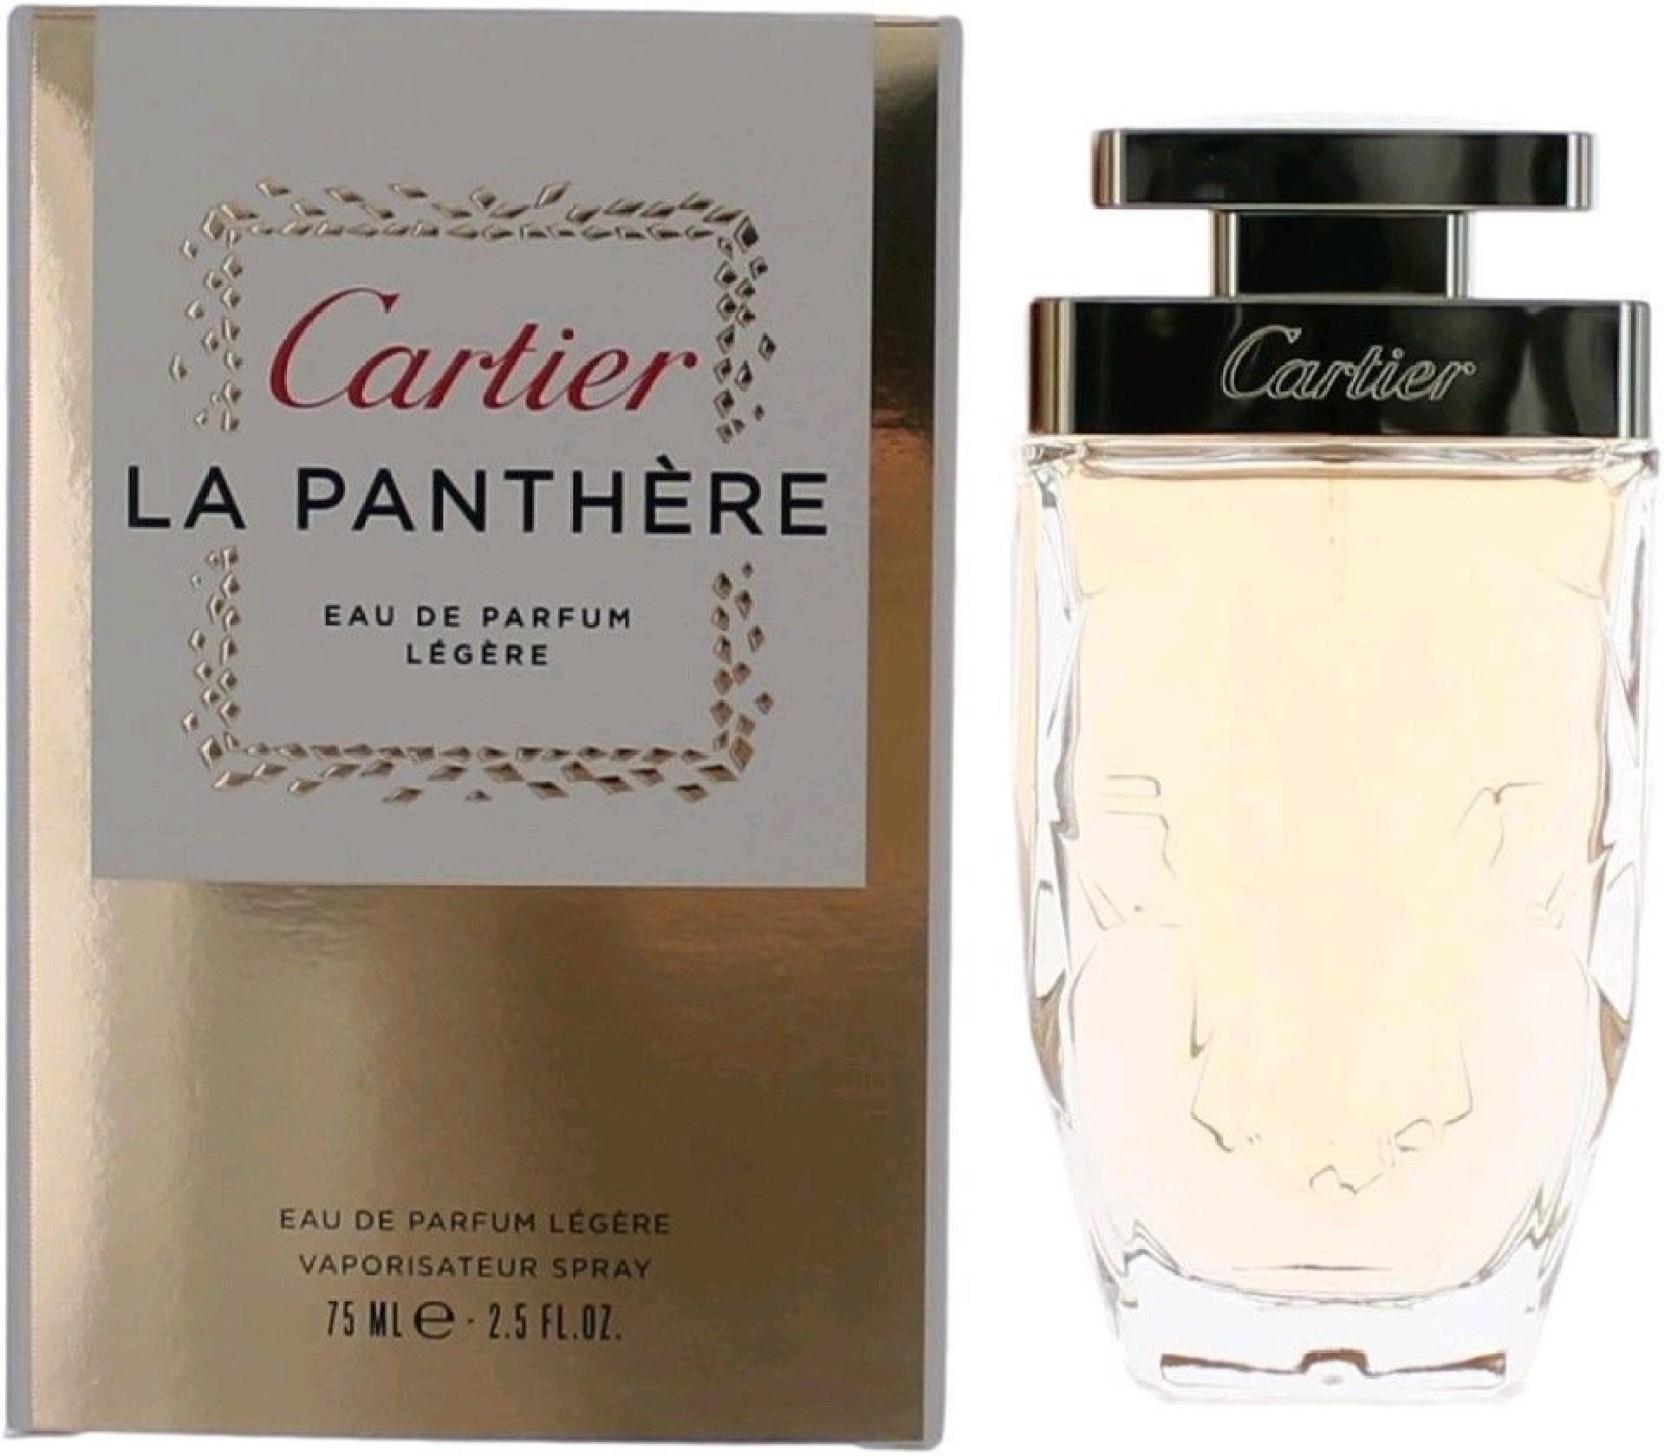 5870285ff3 Buy Cartier Eau De Perfume - 75 ml Online In India | Flipkart.com